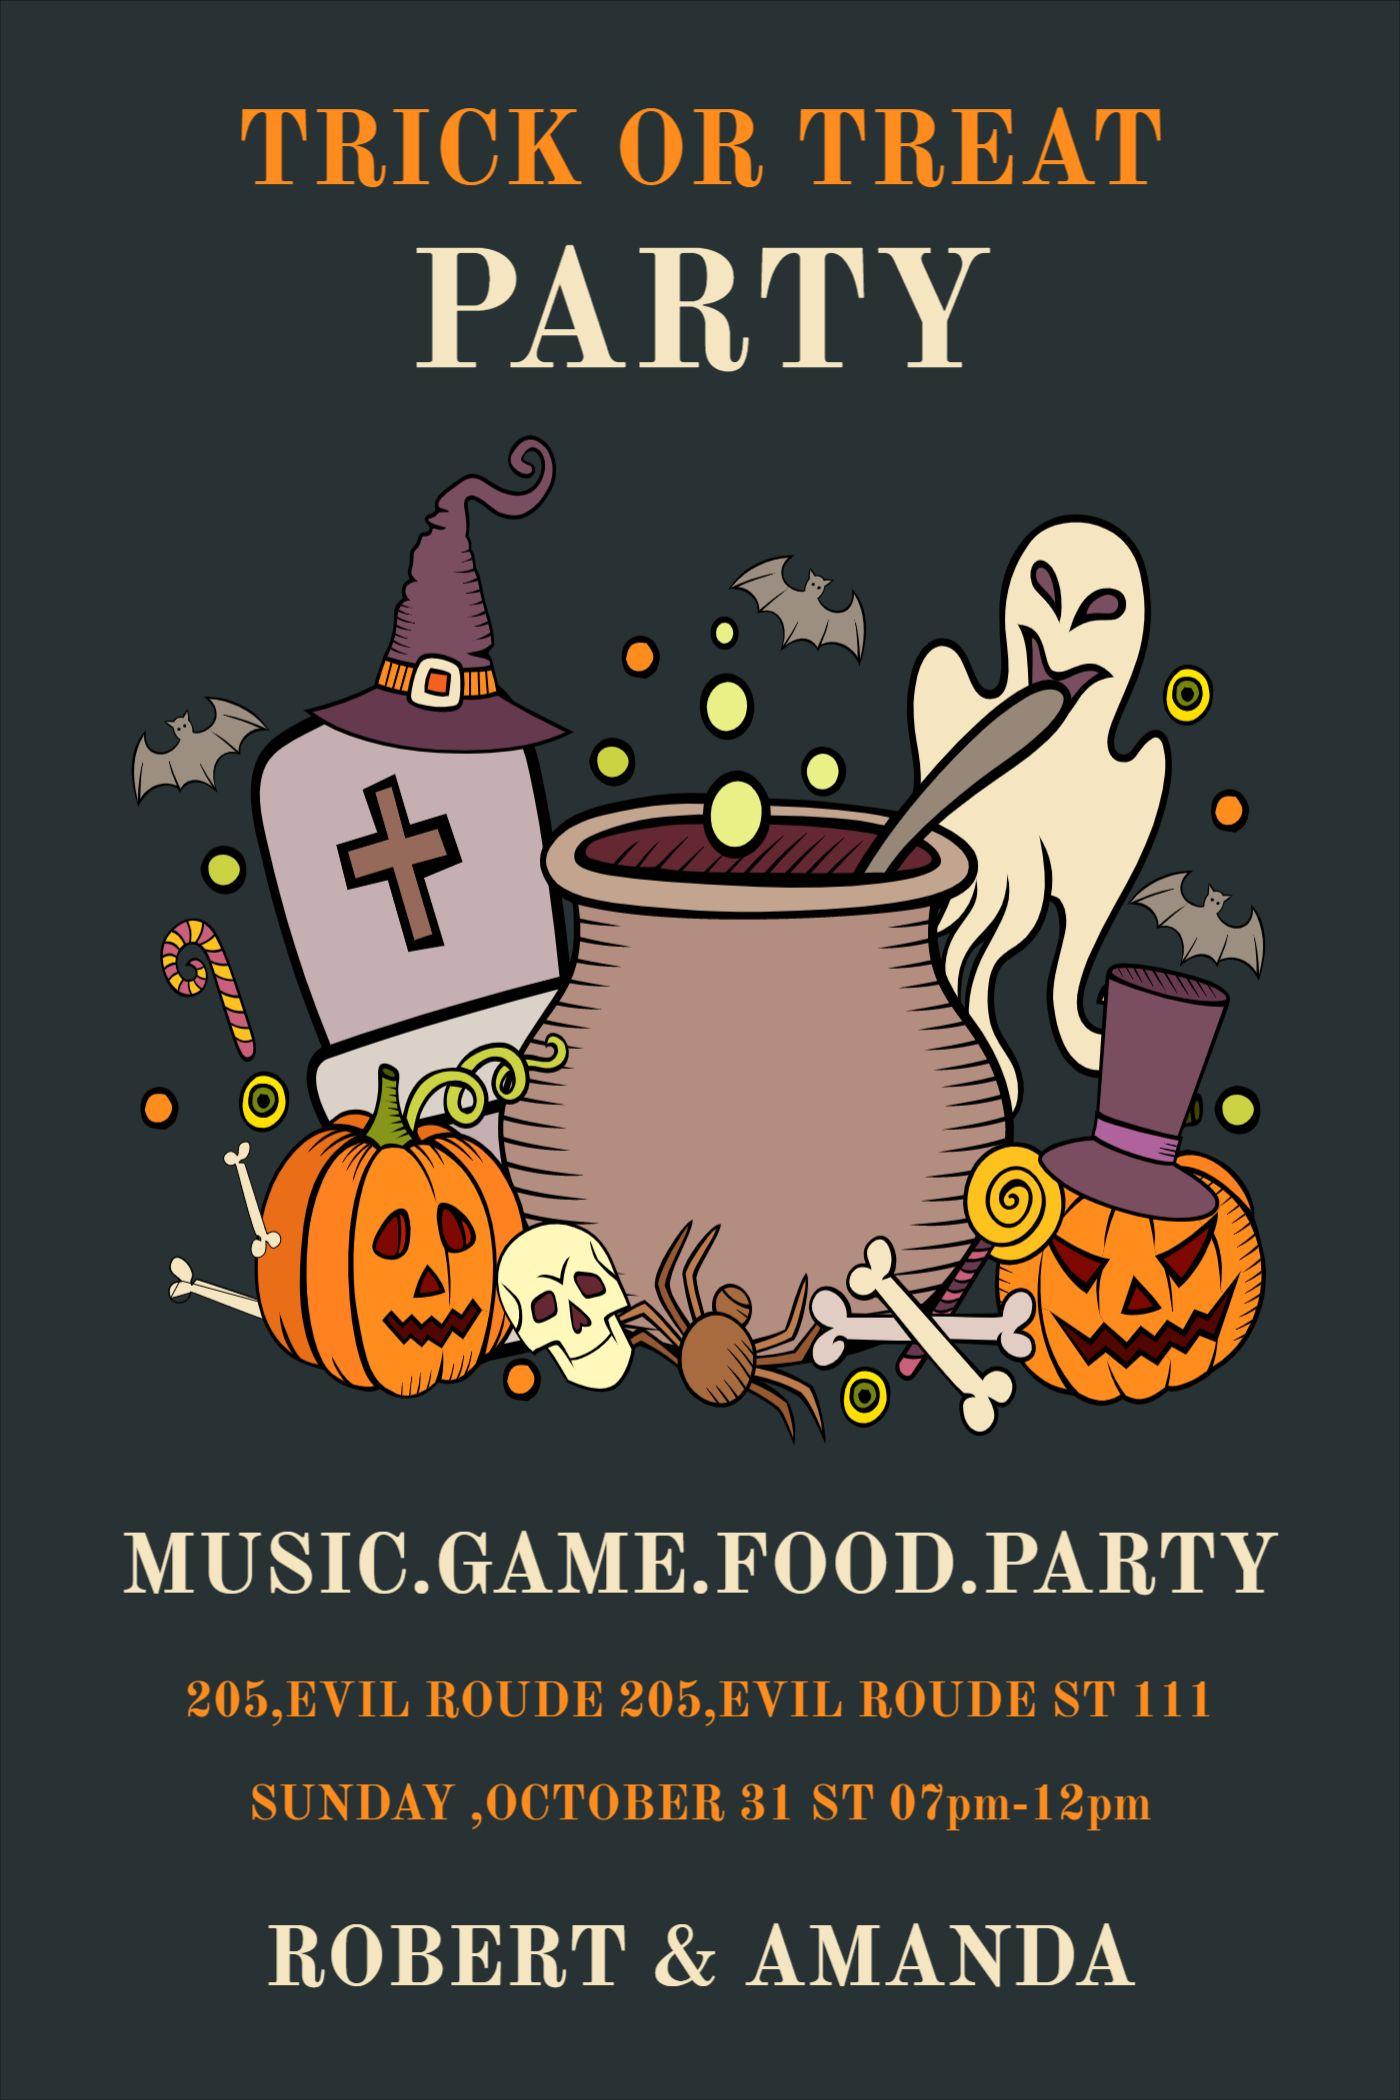 Trick or Treat Party Invitation Design